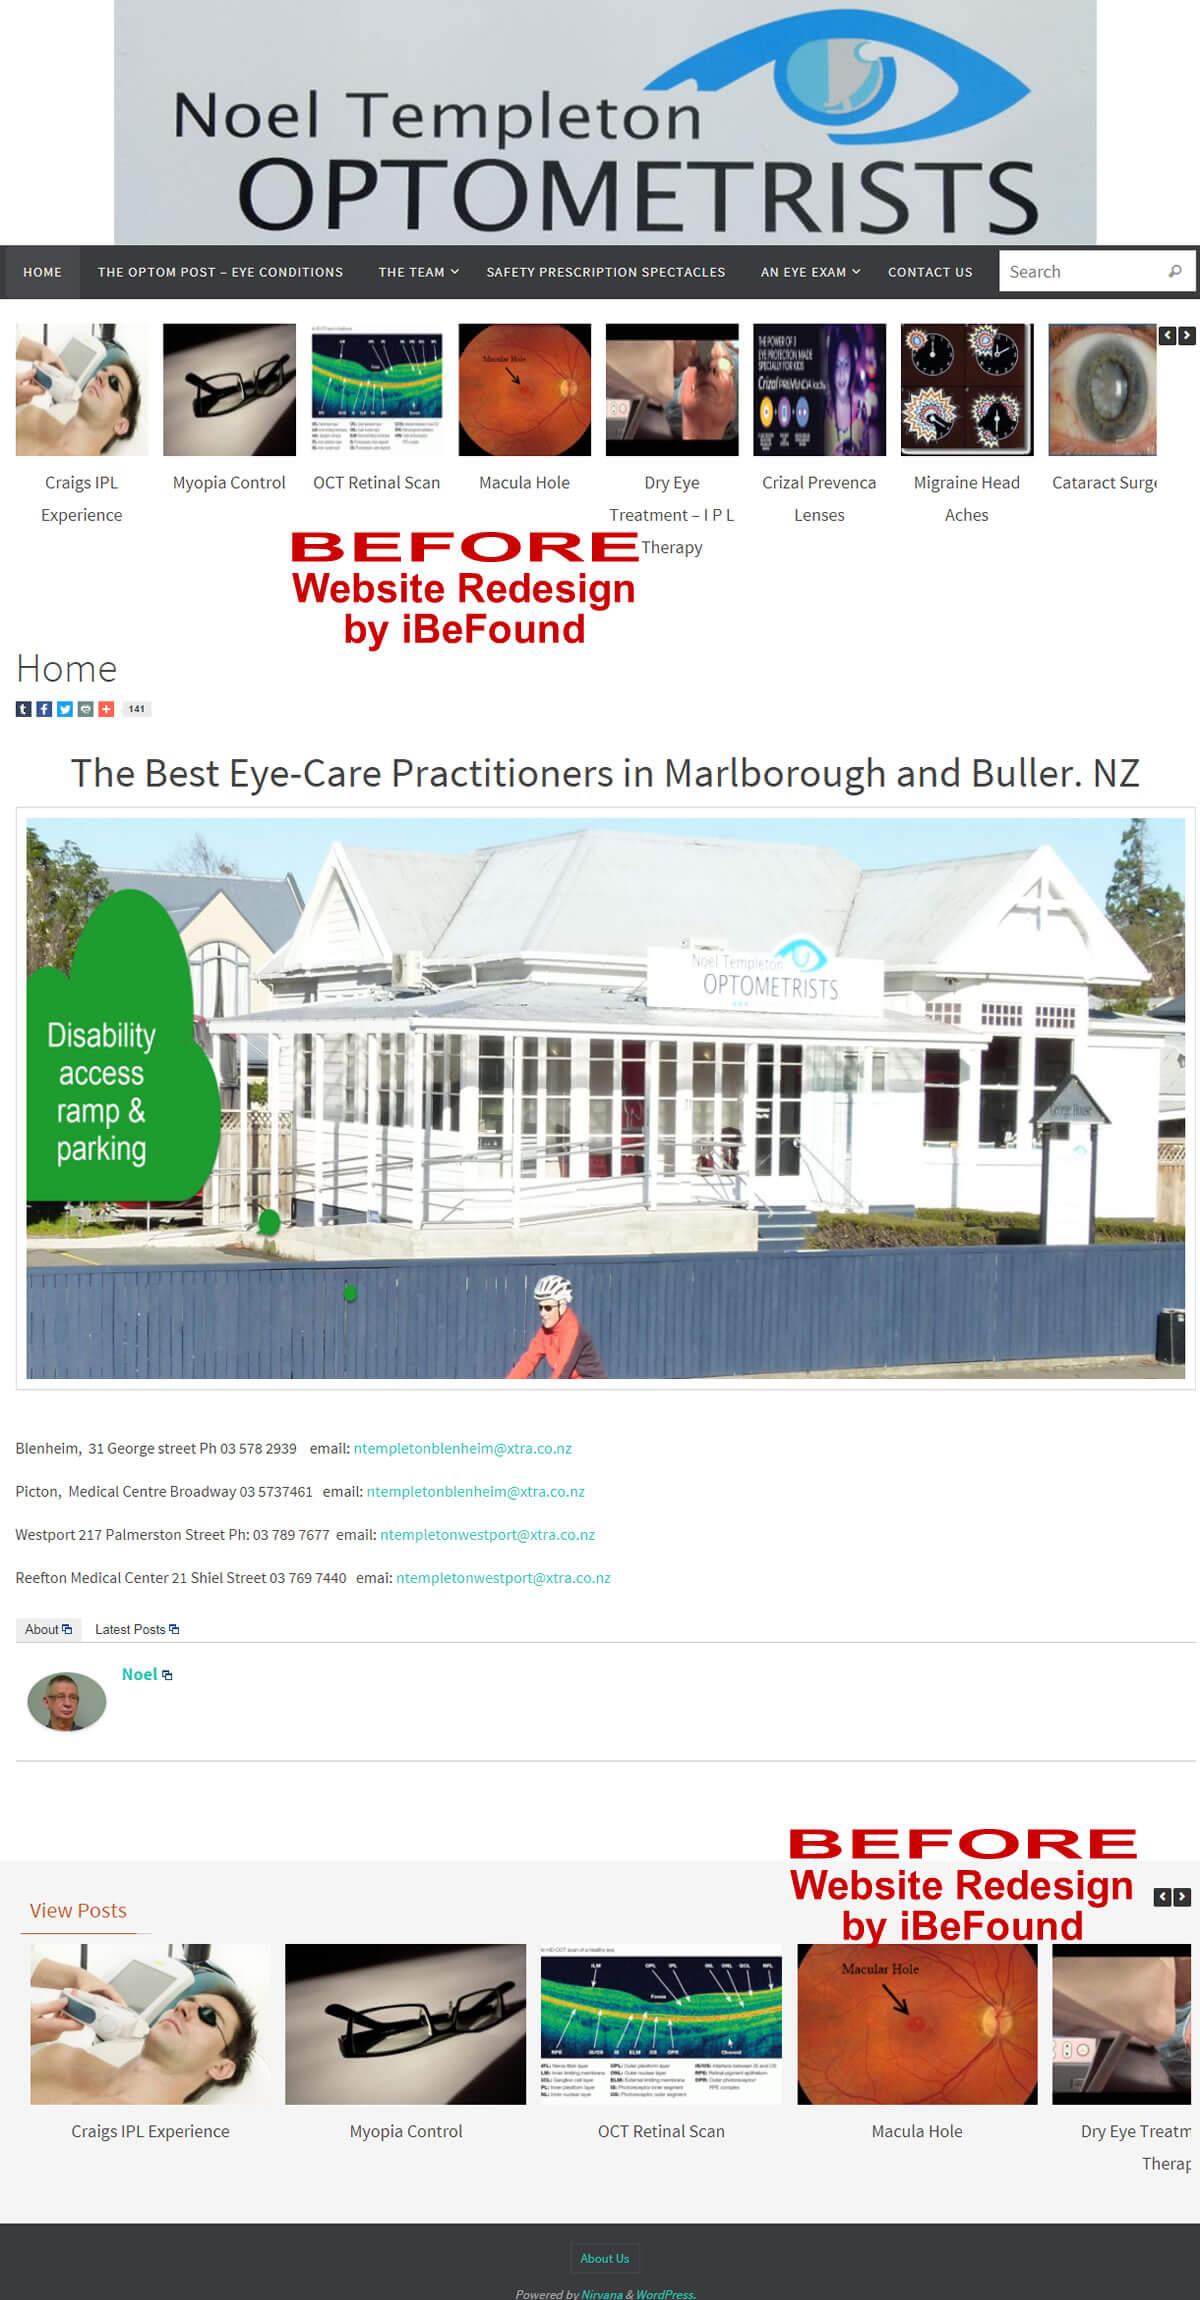 Homepage Of Noel Templeton Optometrists Before Website Redesign By IBeFound